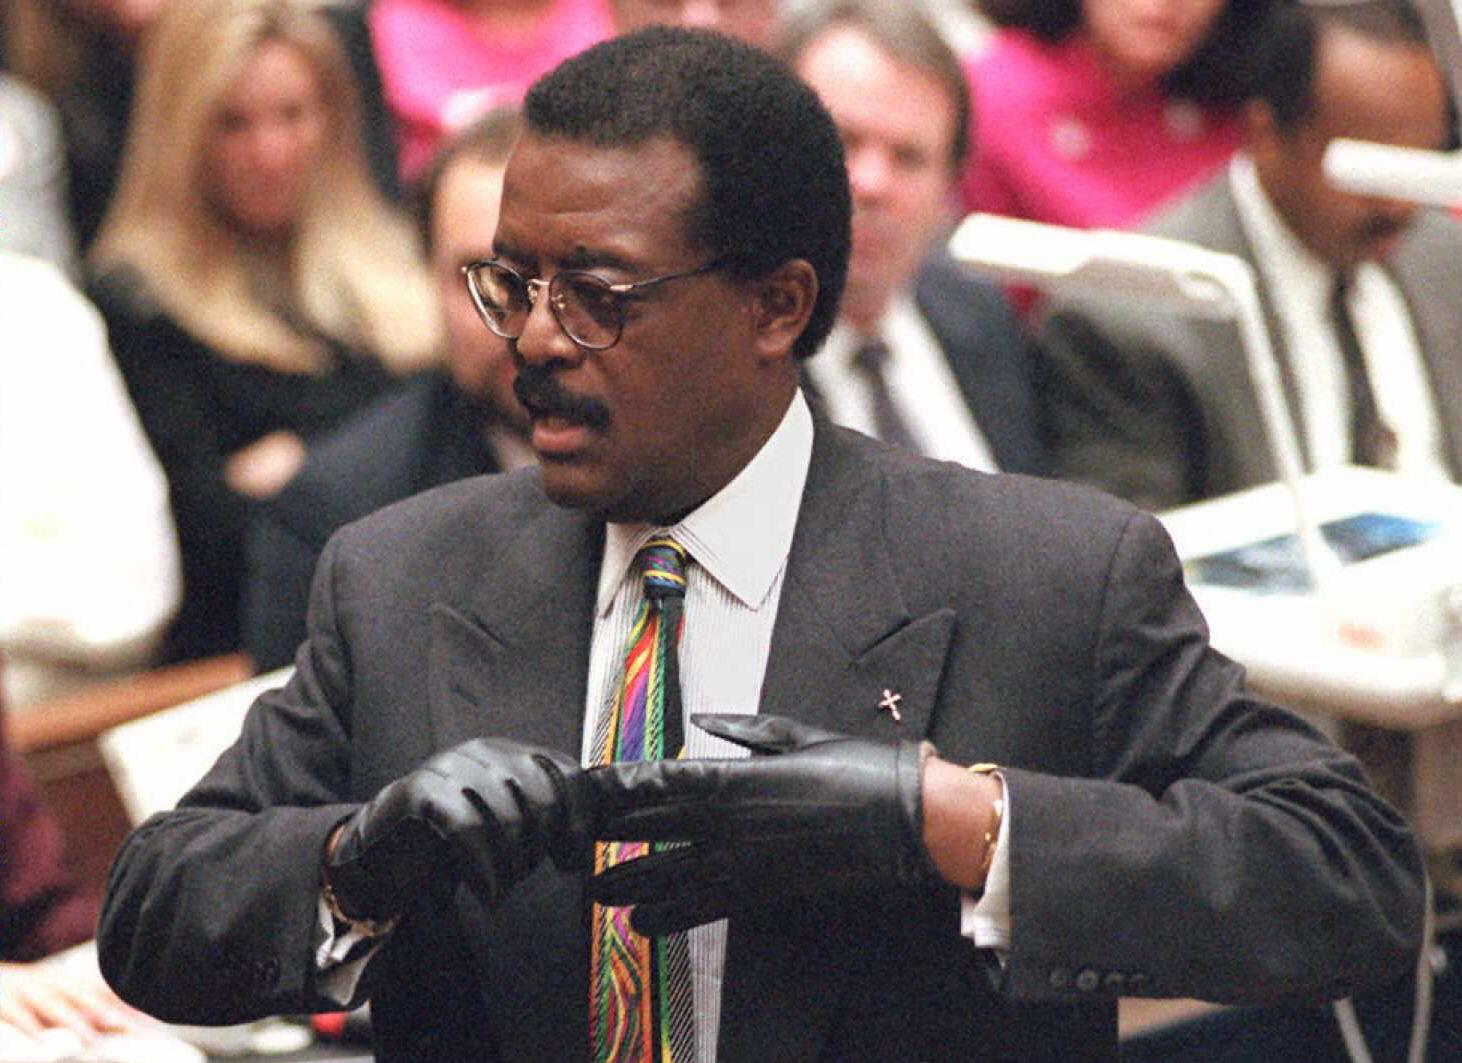 Defense lawyer Johnnie Cochran Jr. puts on a glove